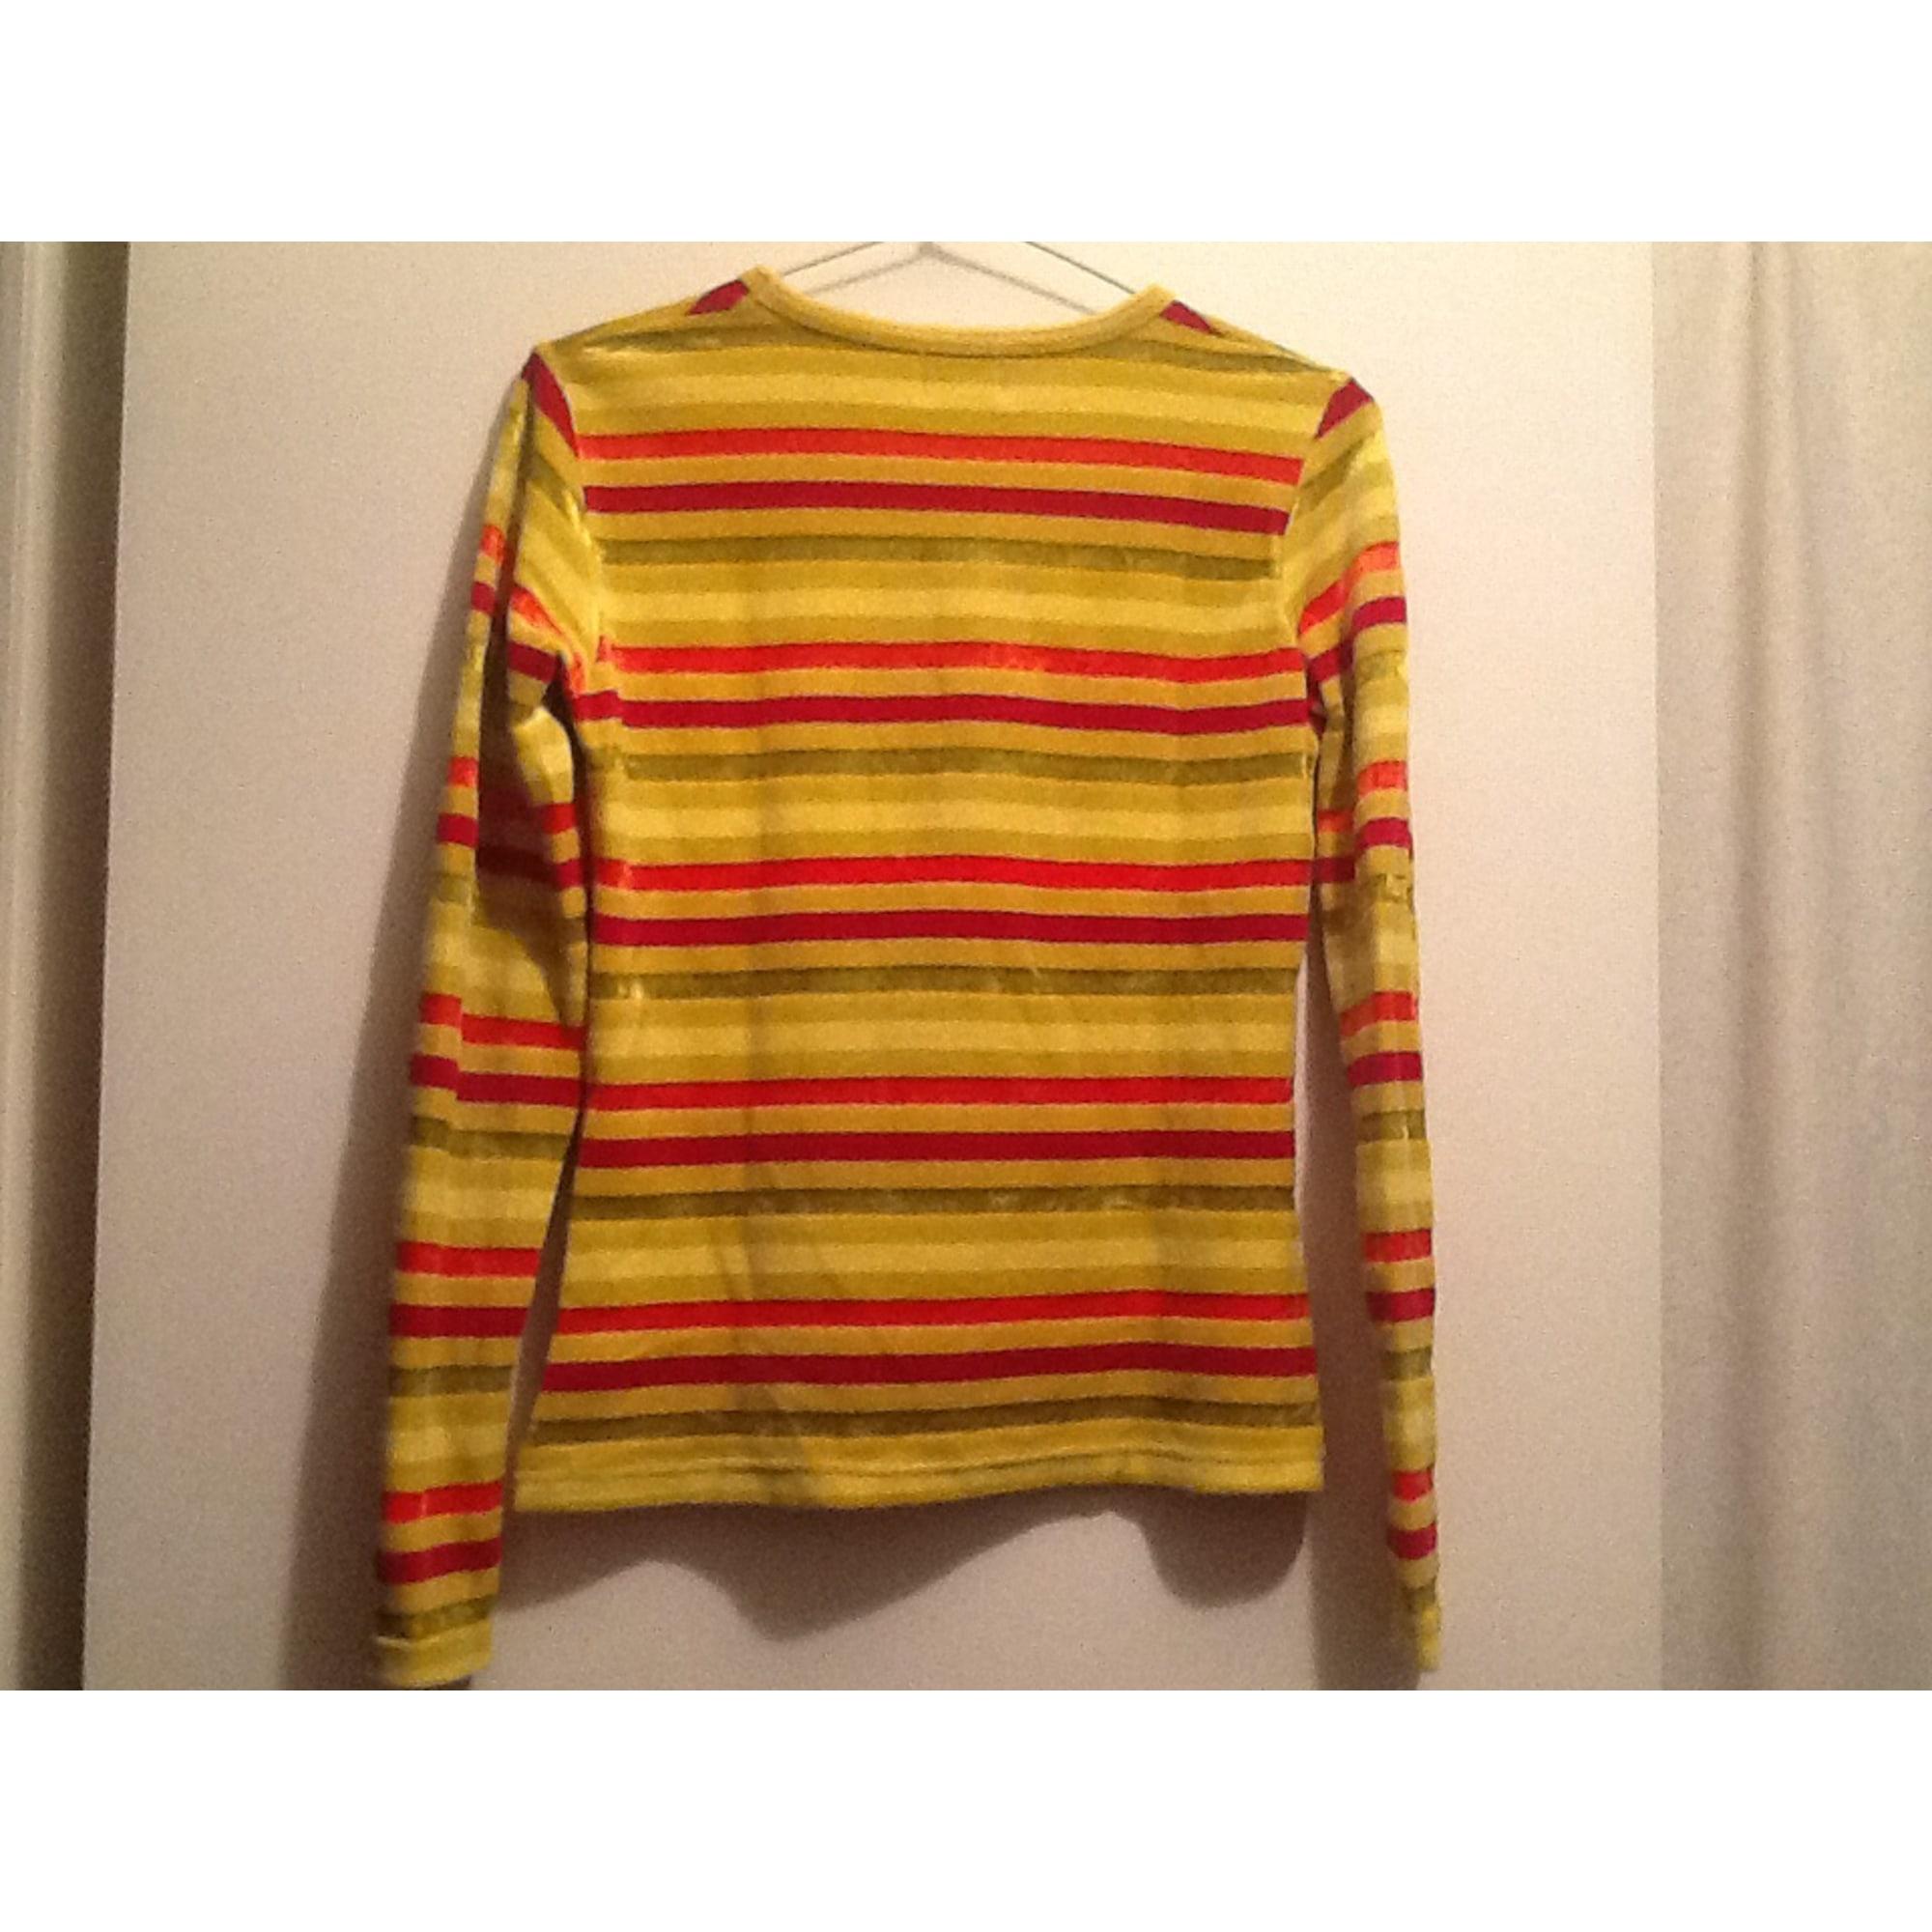 Top, Tee-shirt KENZO Jaune , orange , rouge a rayures